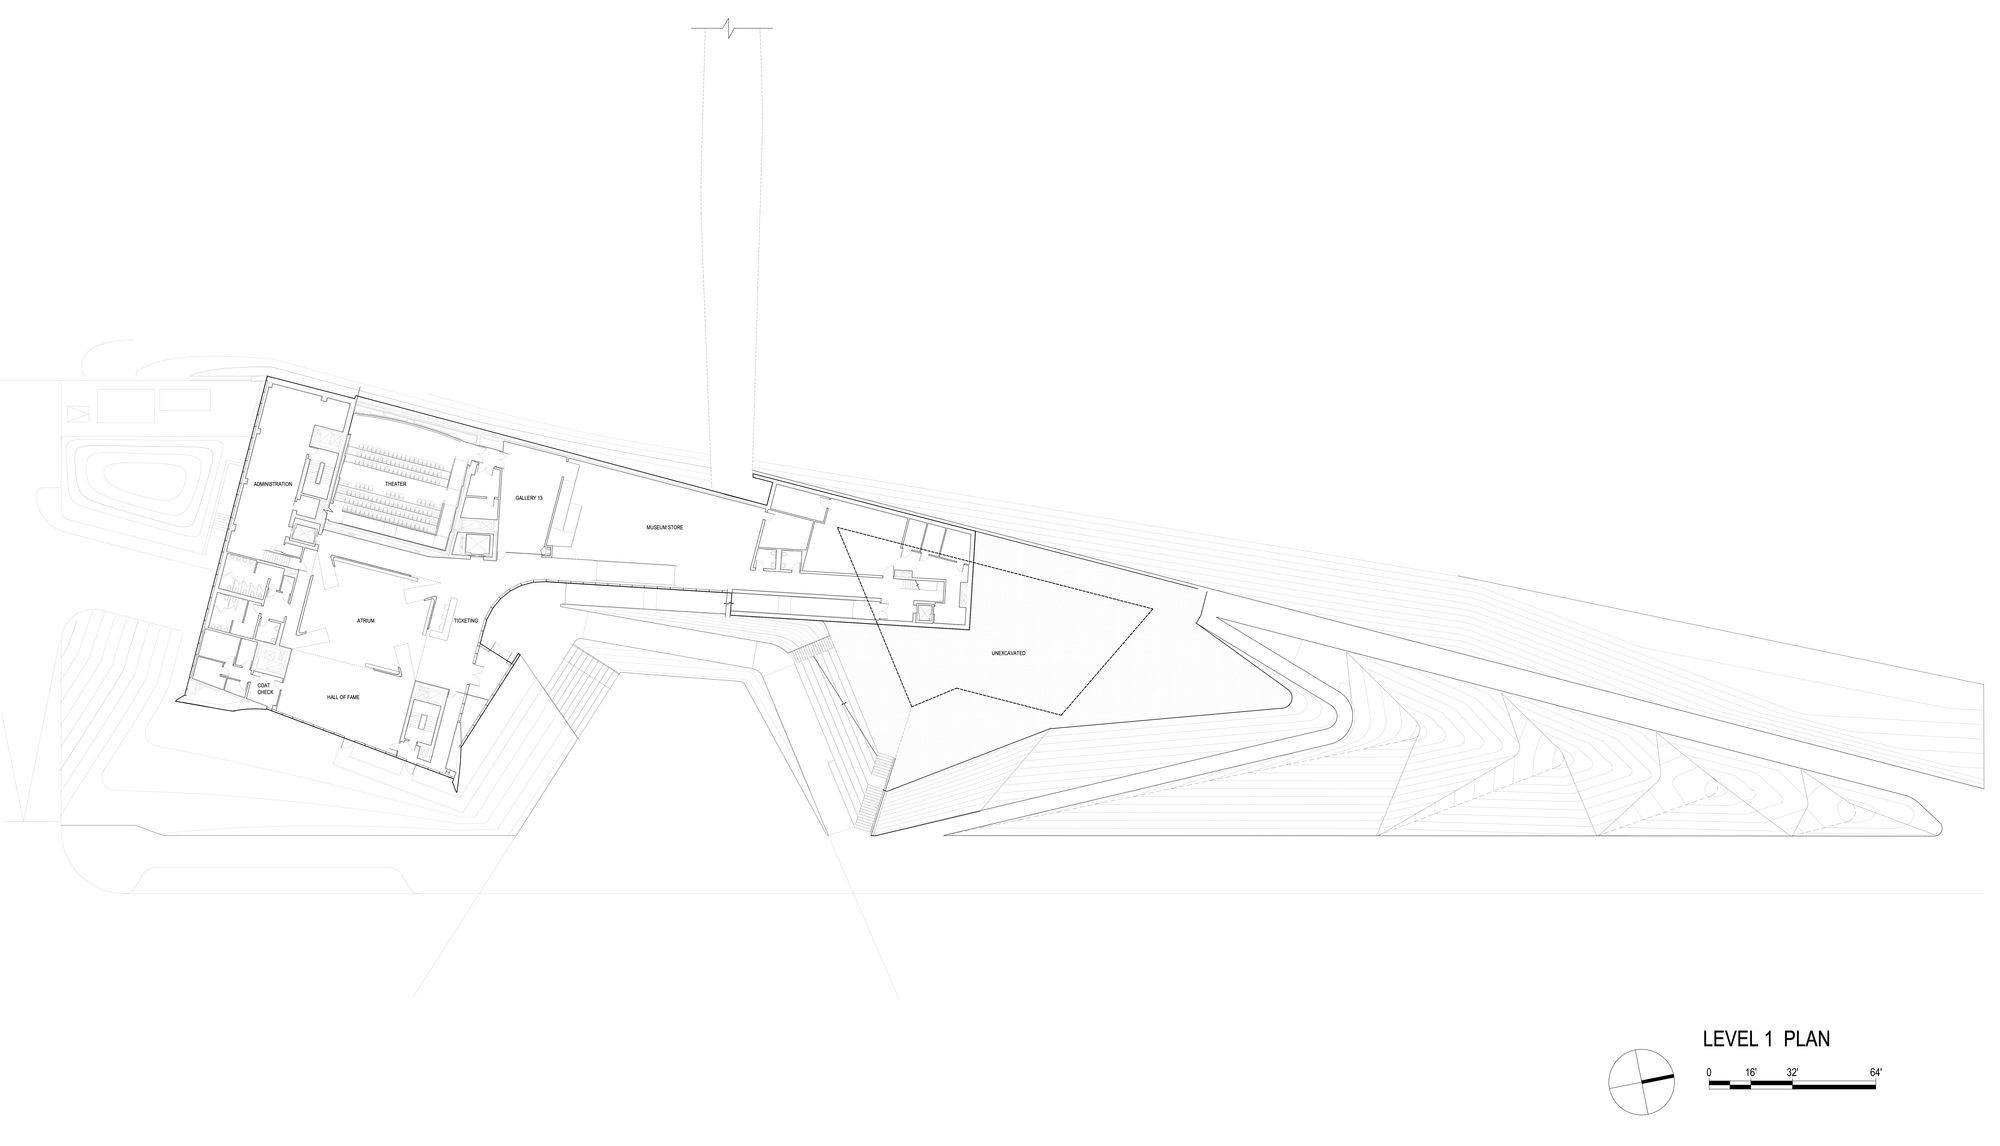 m1 _USOPM_Plans_4.jpg